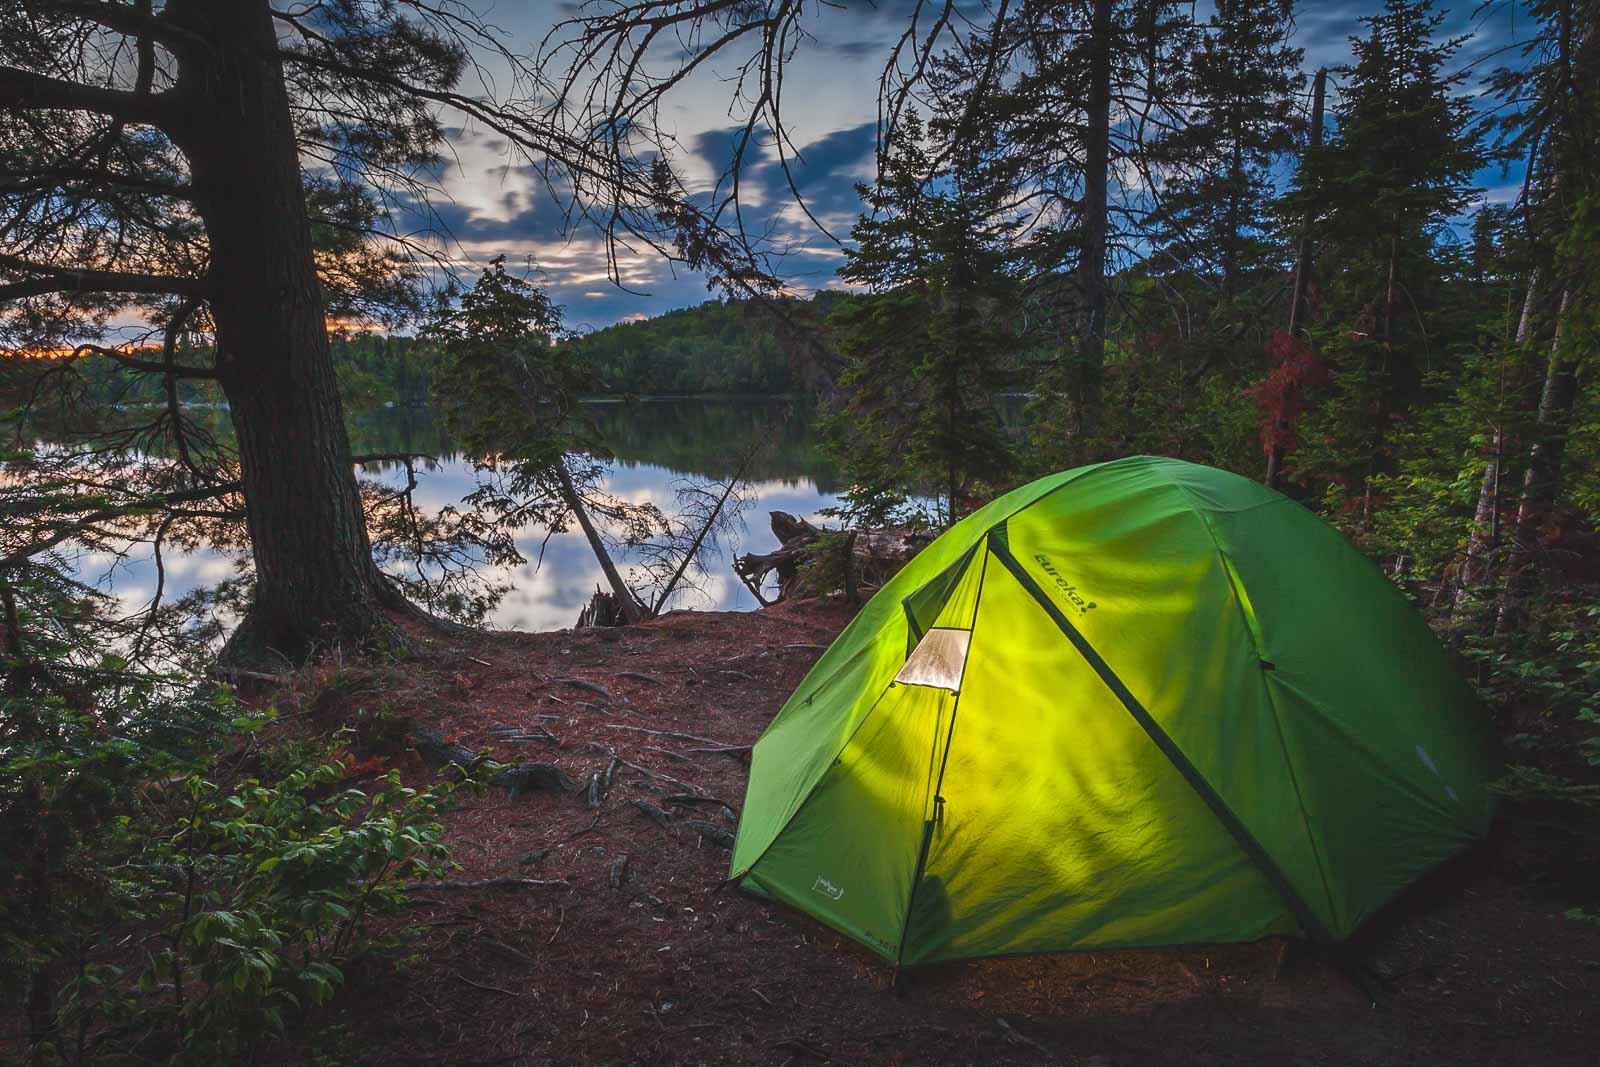 Choosing Best Campsite